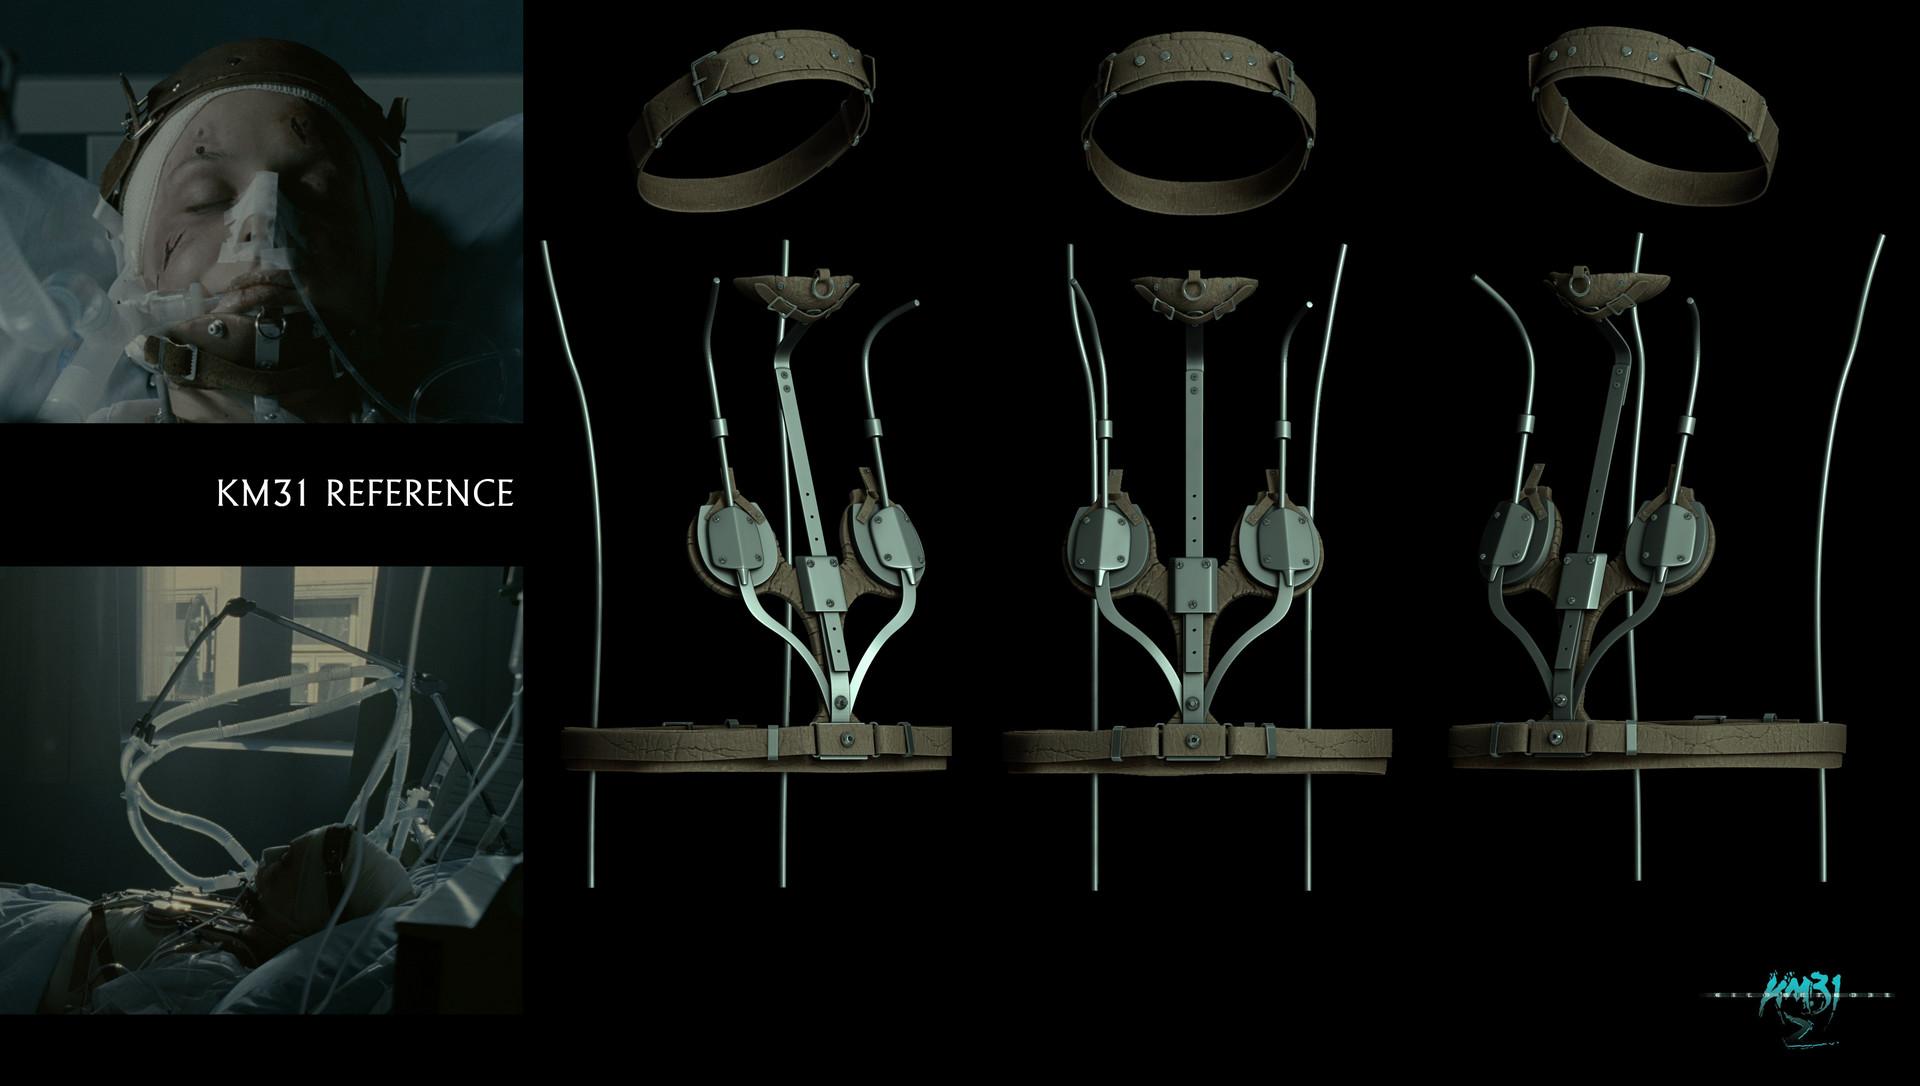 Raul eduardo sanchez osorio km312 agata 01 harness leather sculpt v01